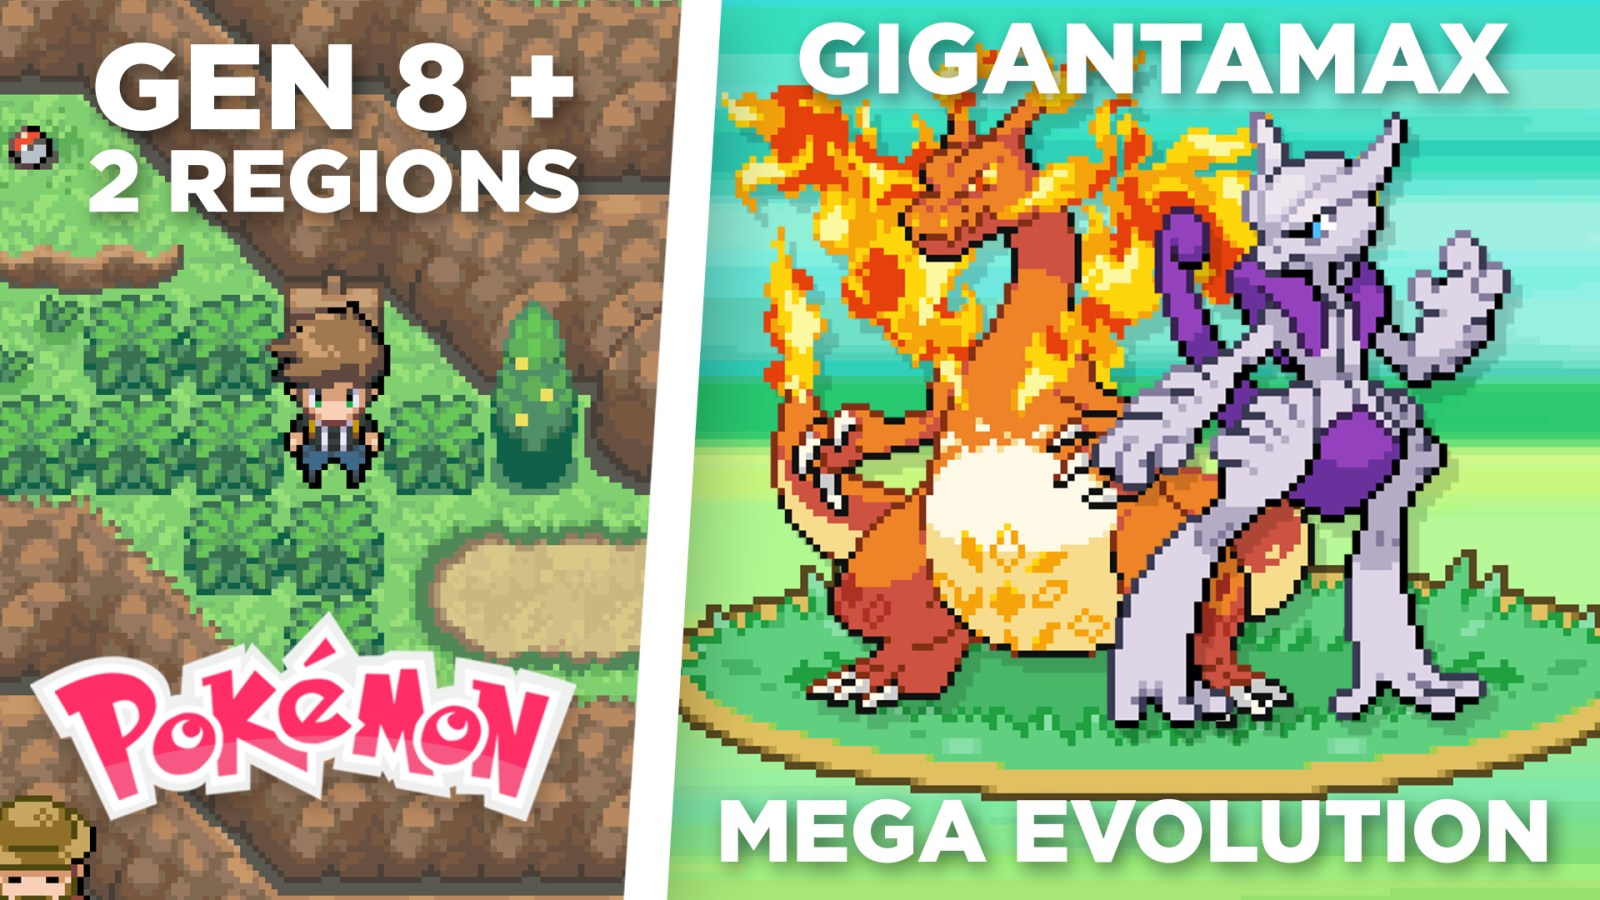 Download zip sun gba moon pokemon and PoKeMoN Sun